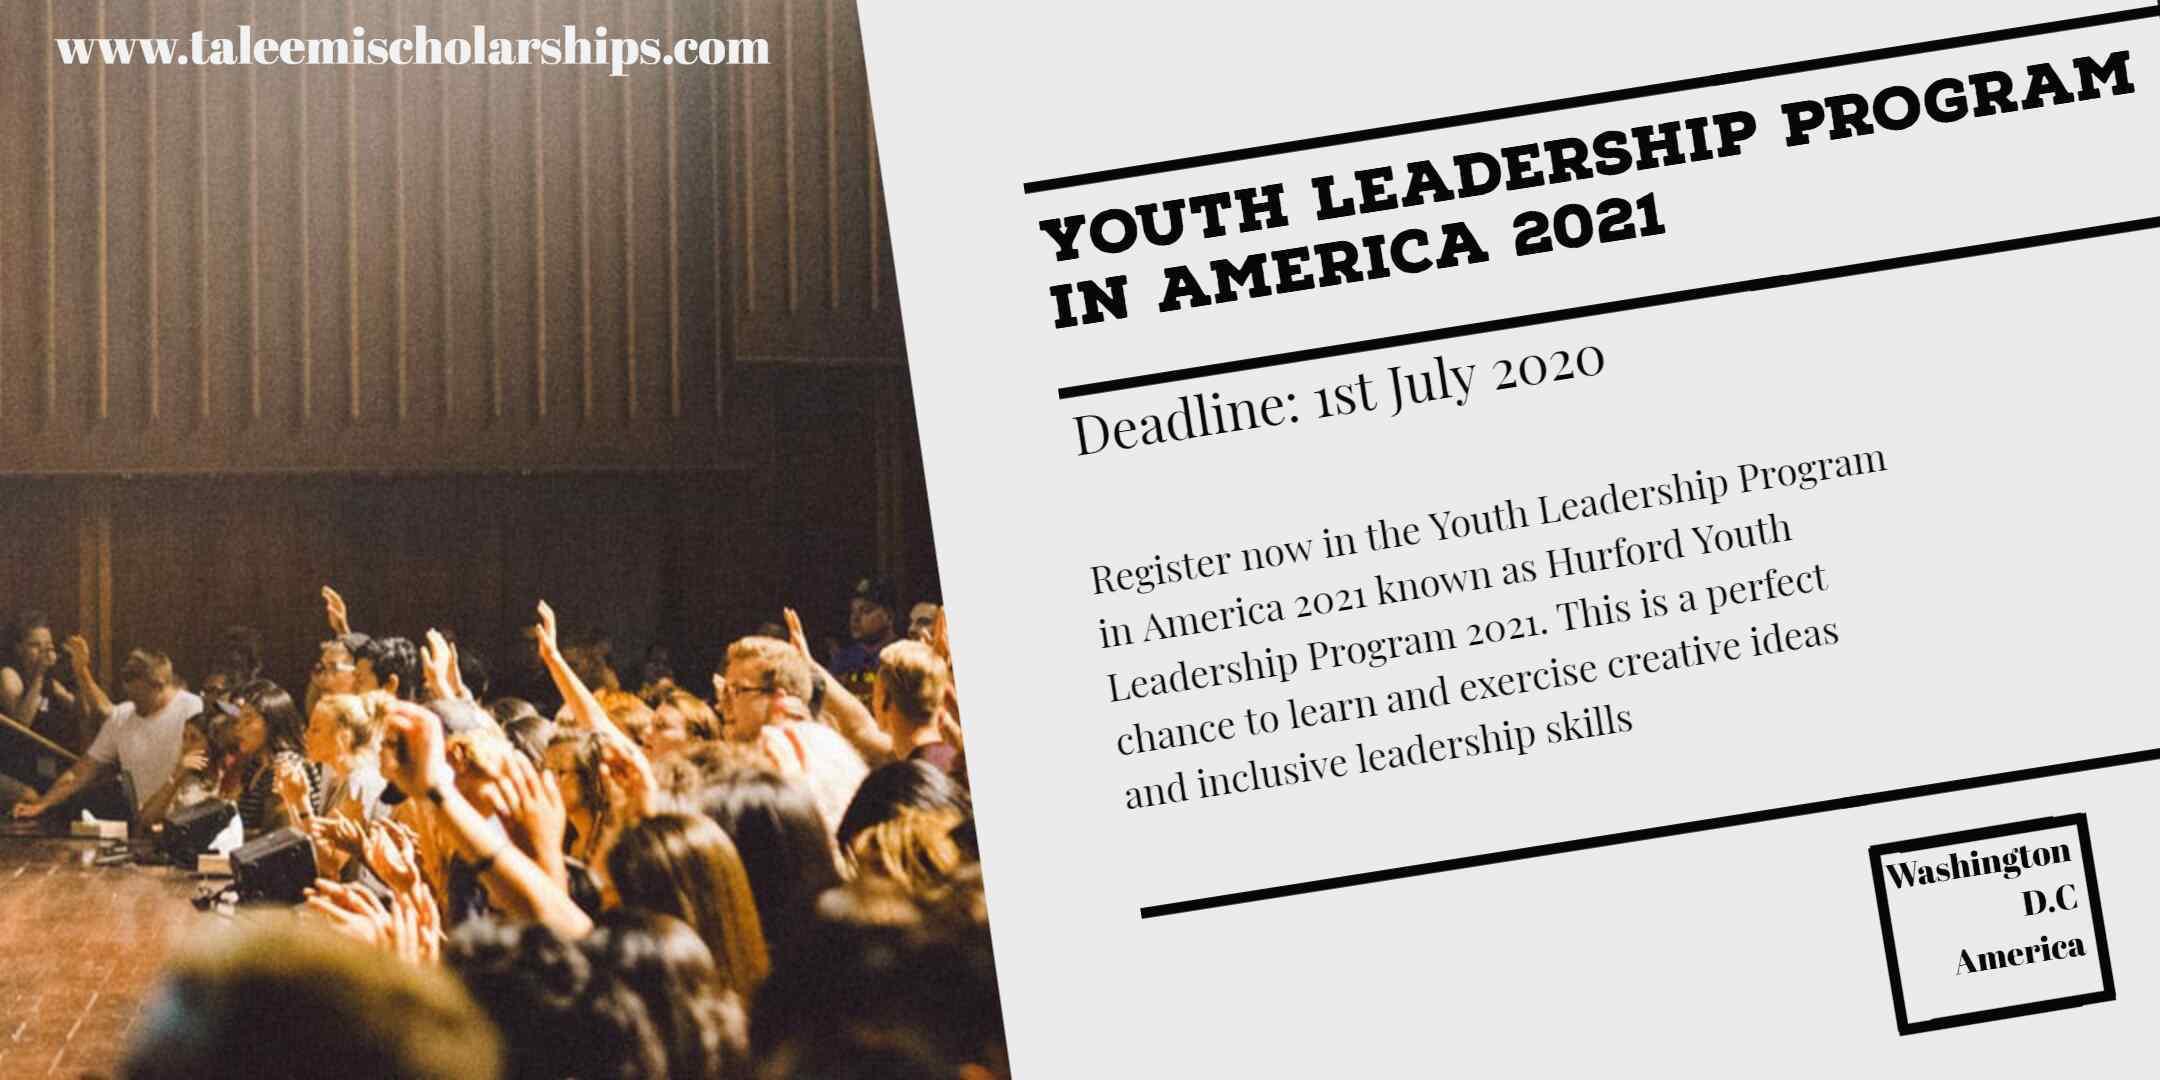 youth-leadership-program-in-america